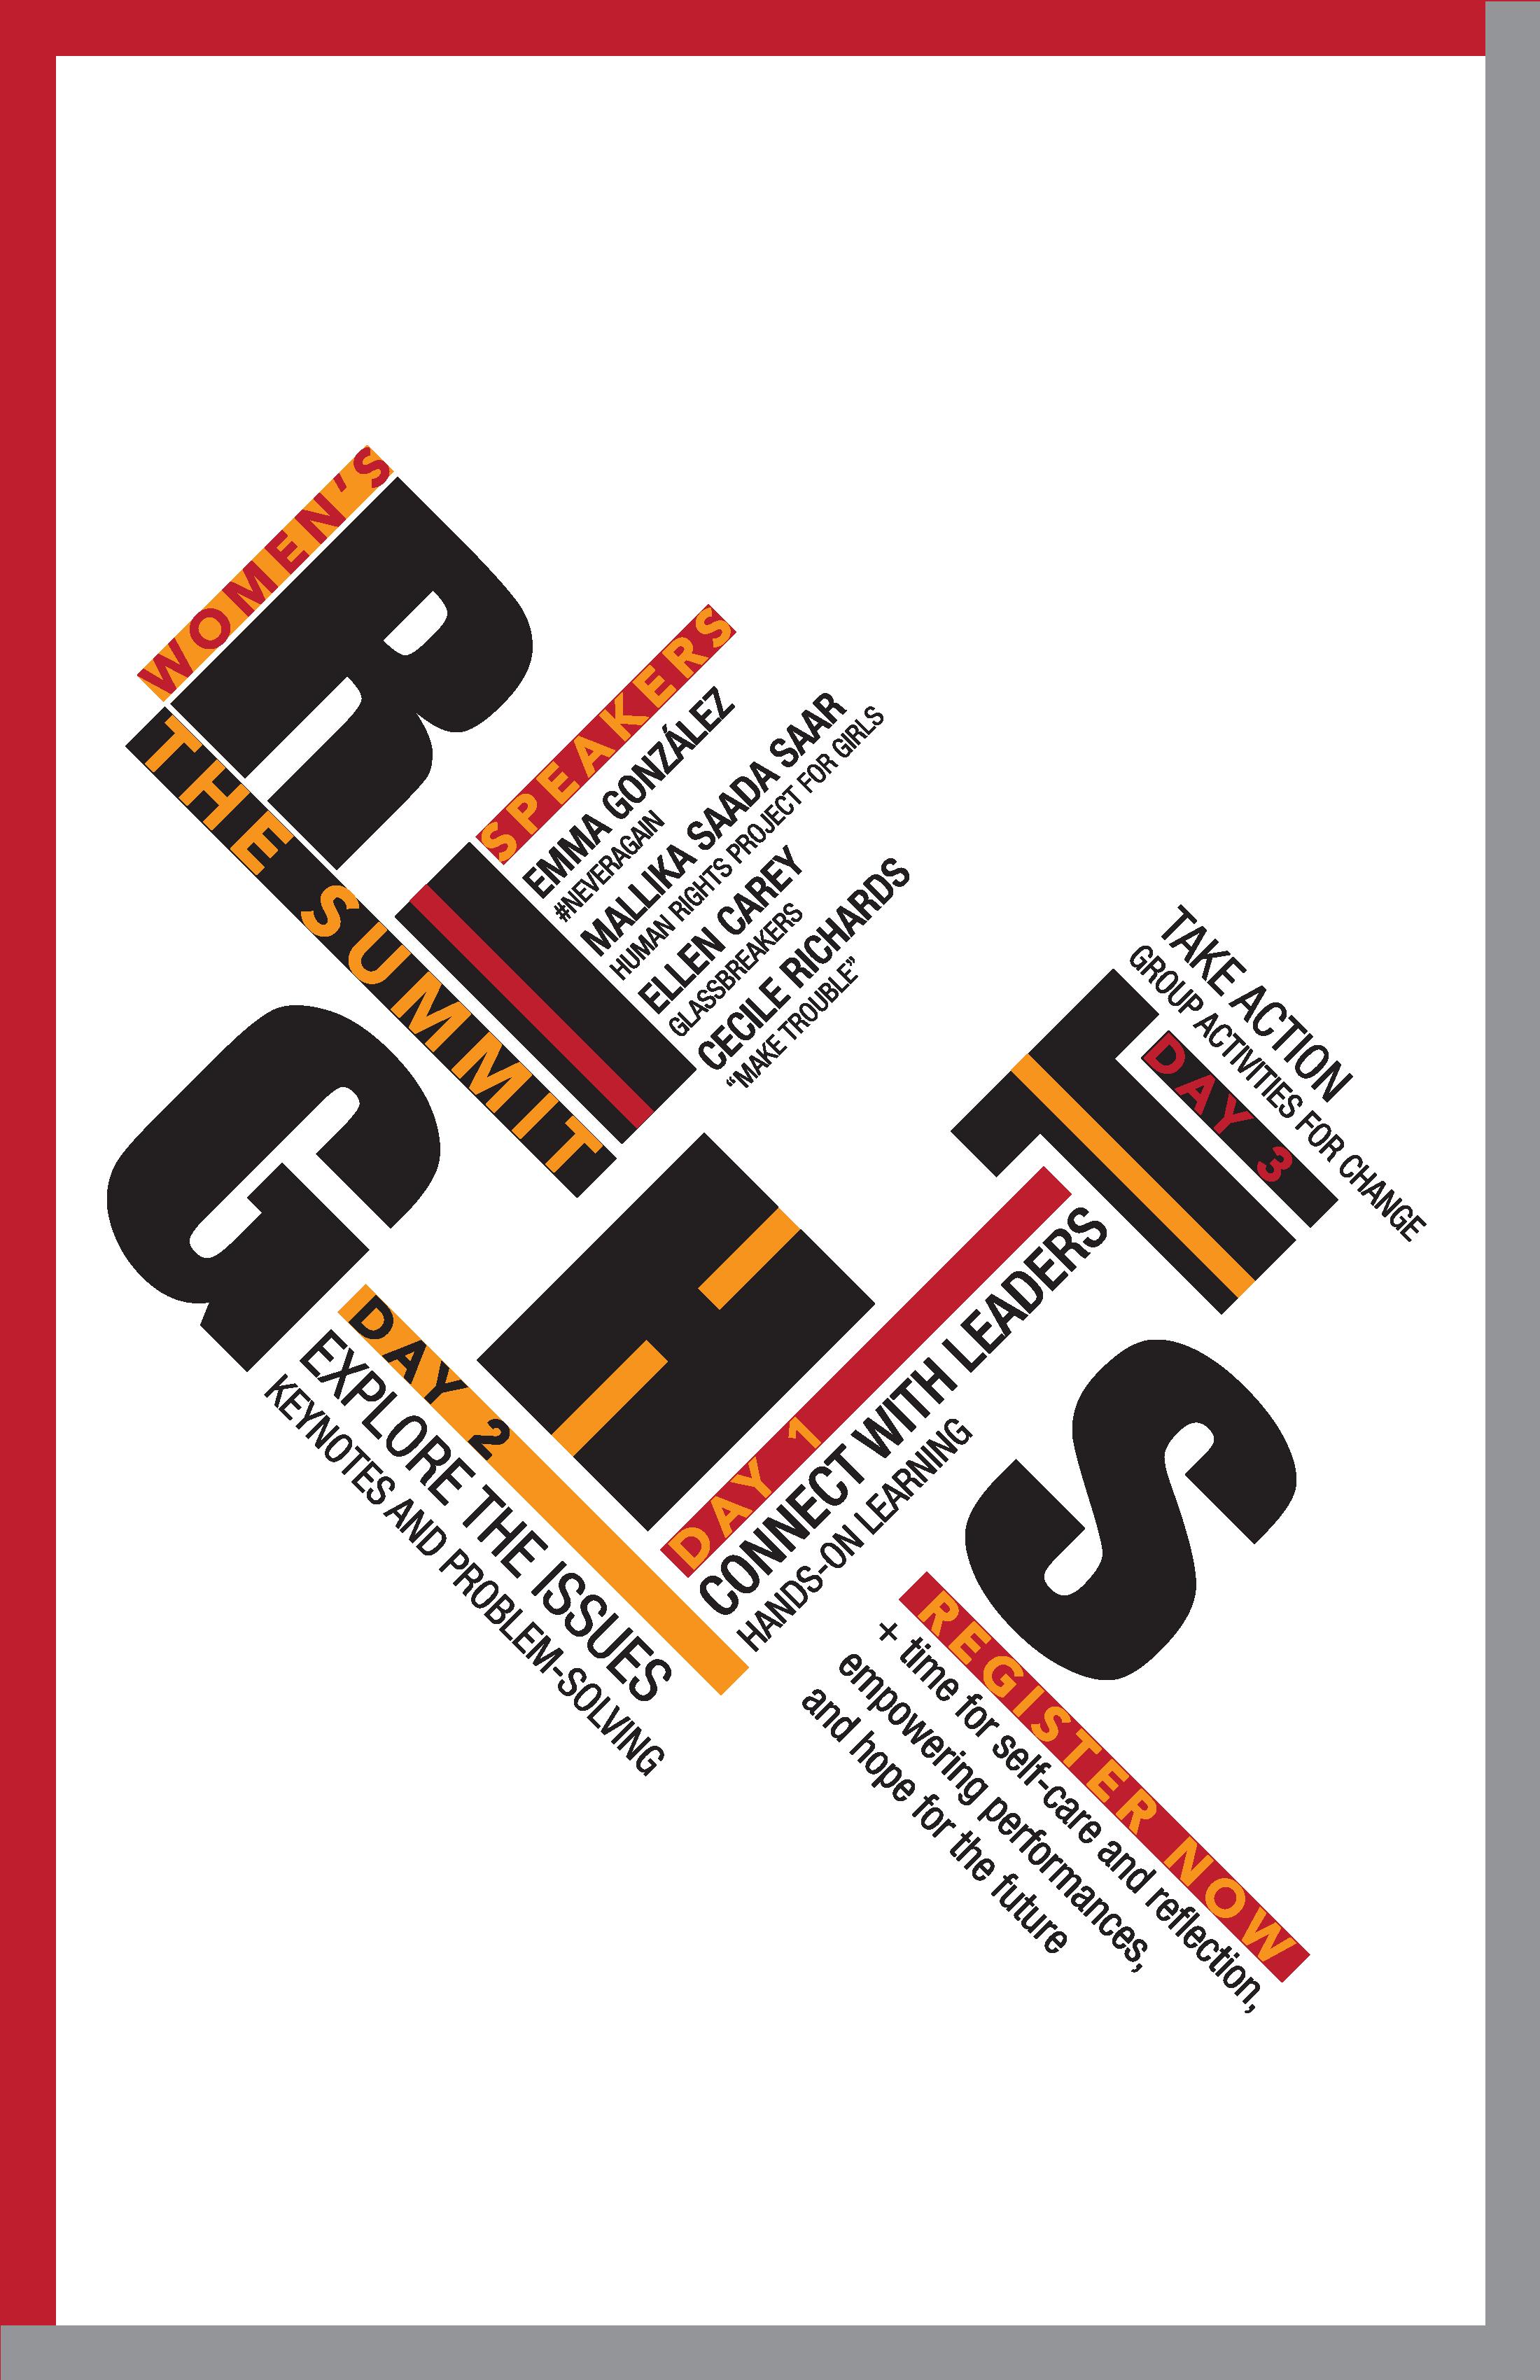 PaulaScher-CBS79Records-Poster.png